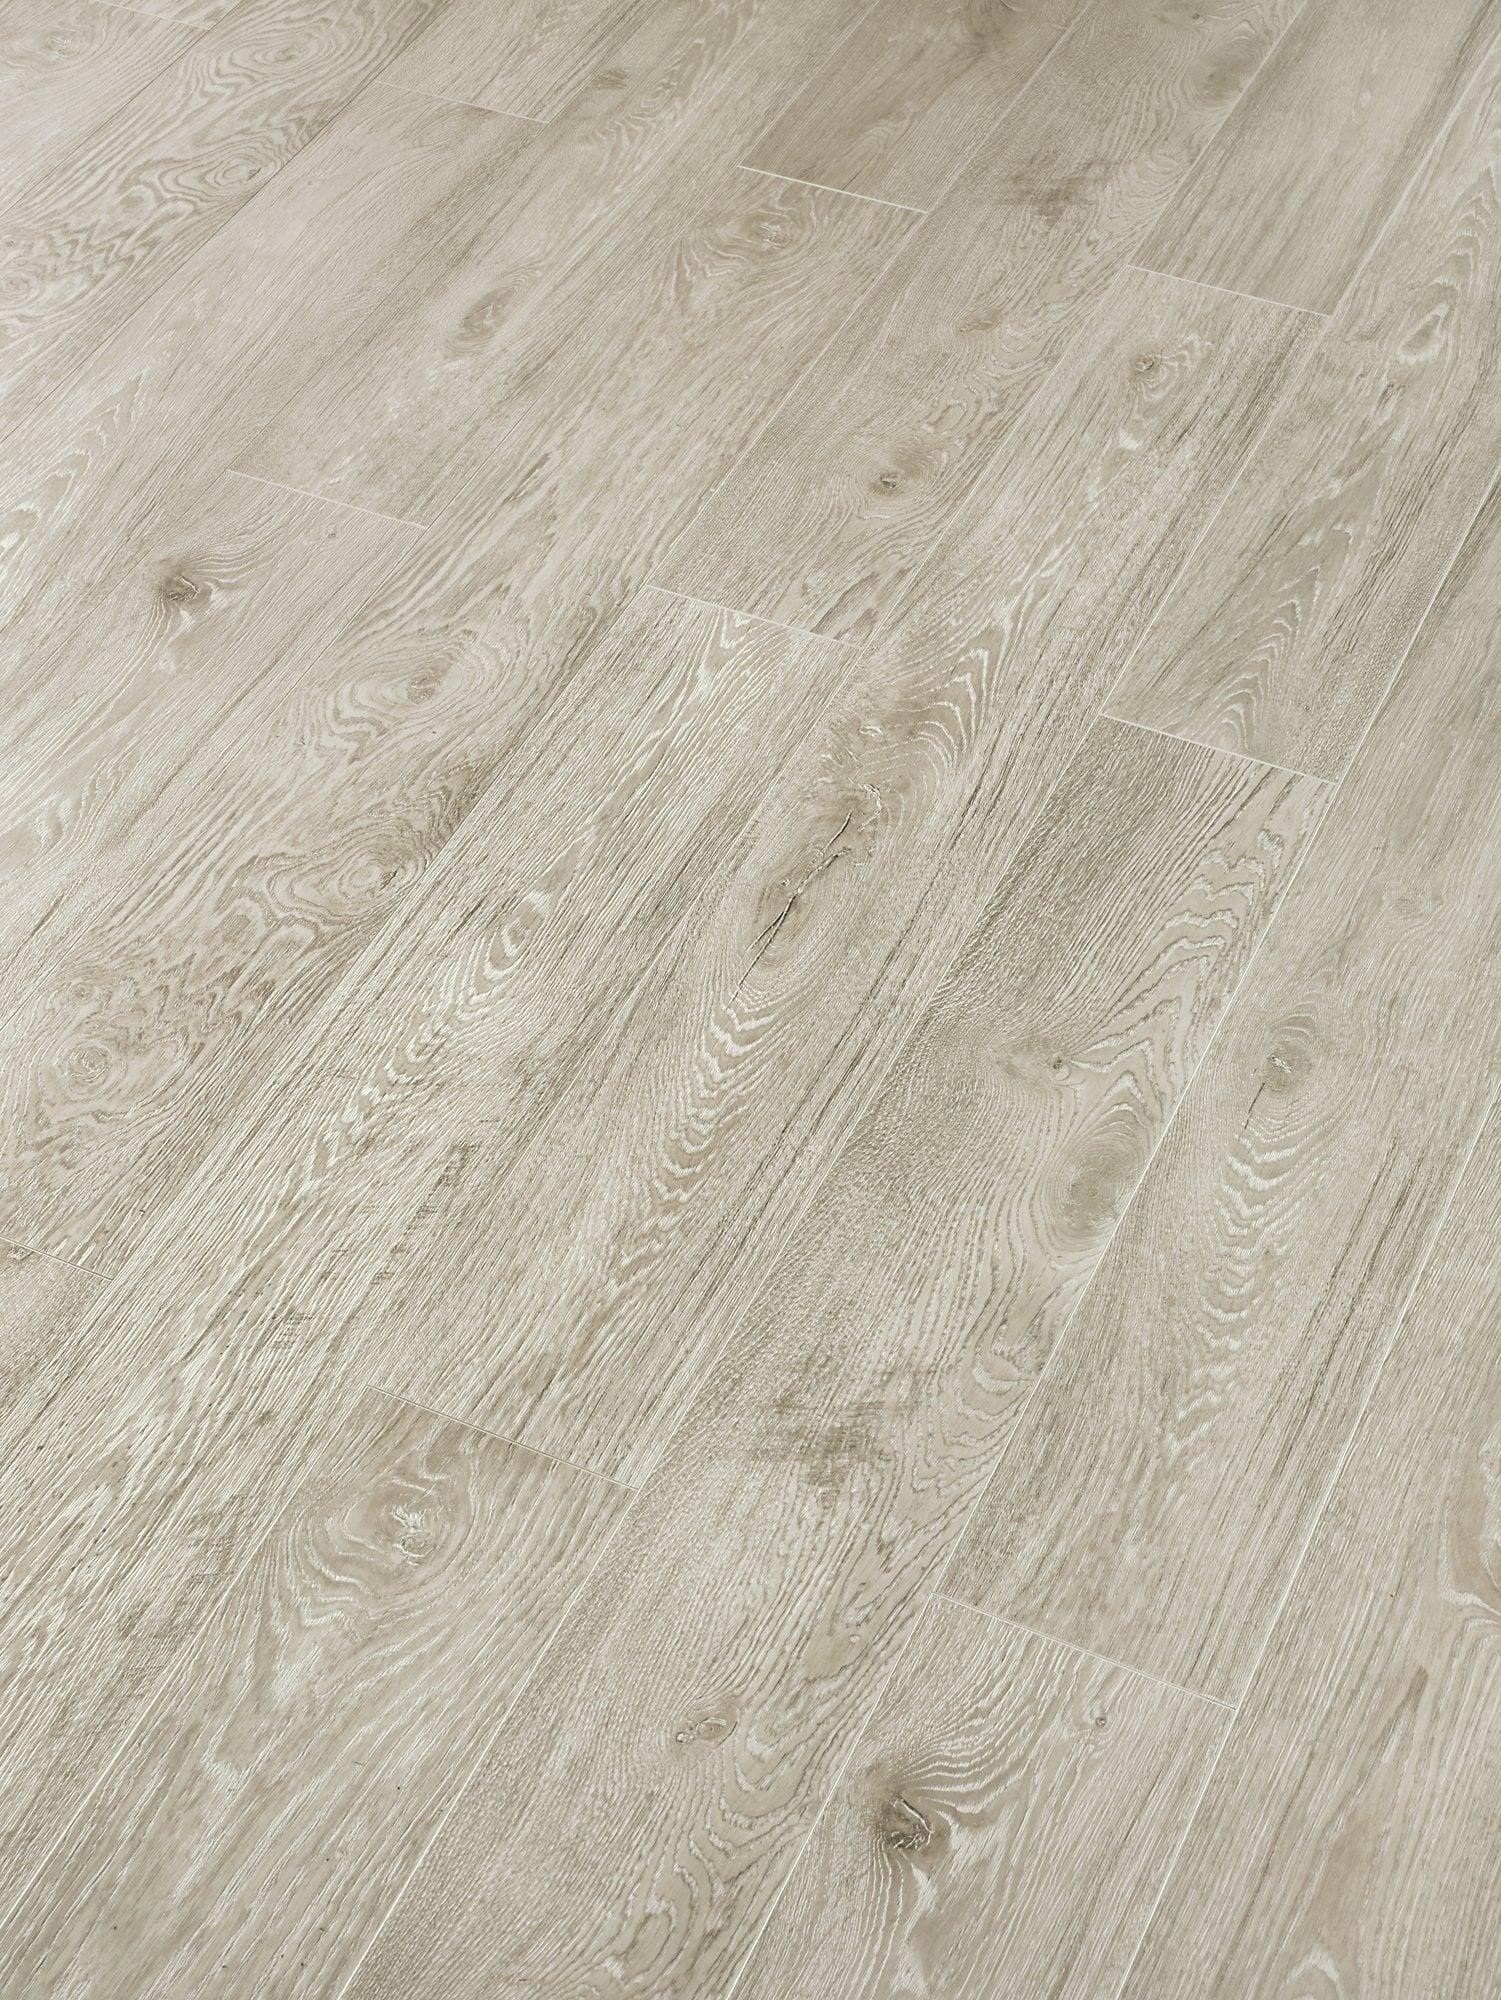 Swiss Krono Grand Selection Oak Sand Aa Floors Toronto